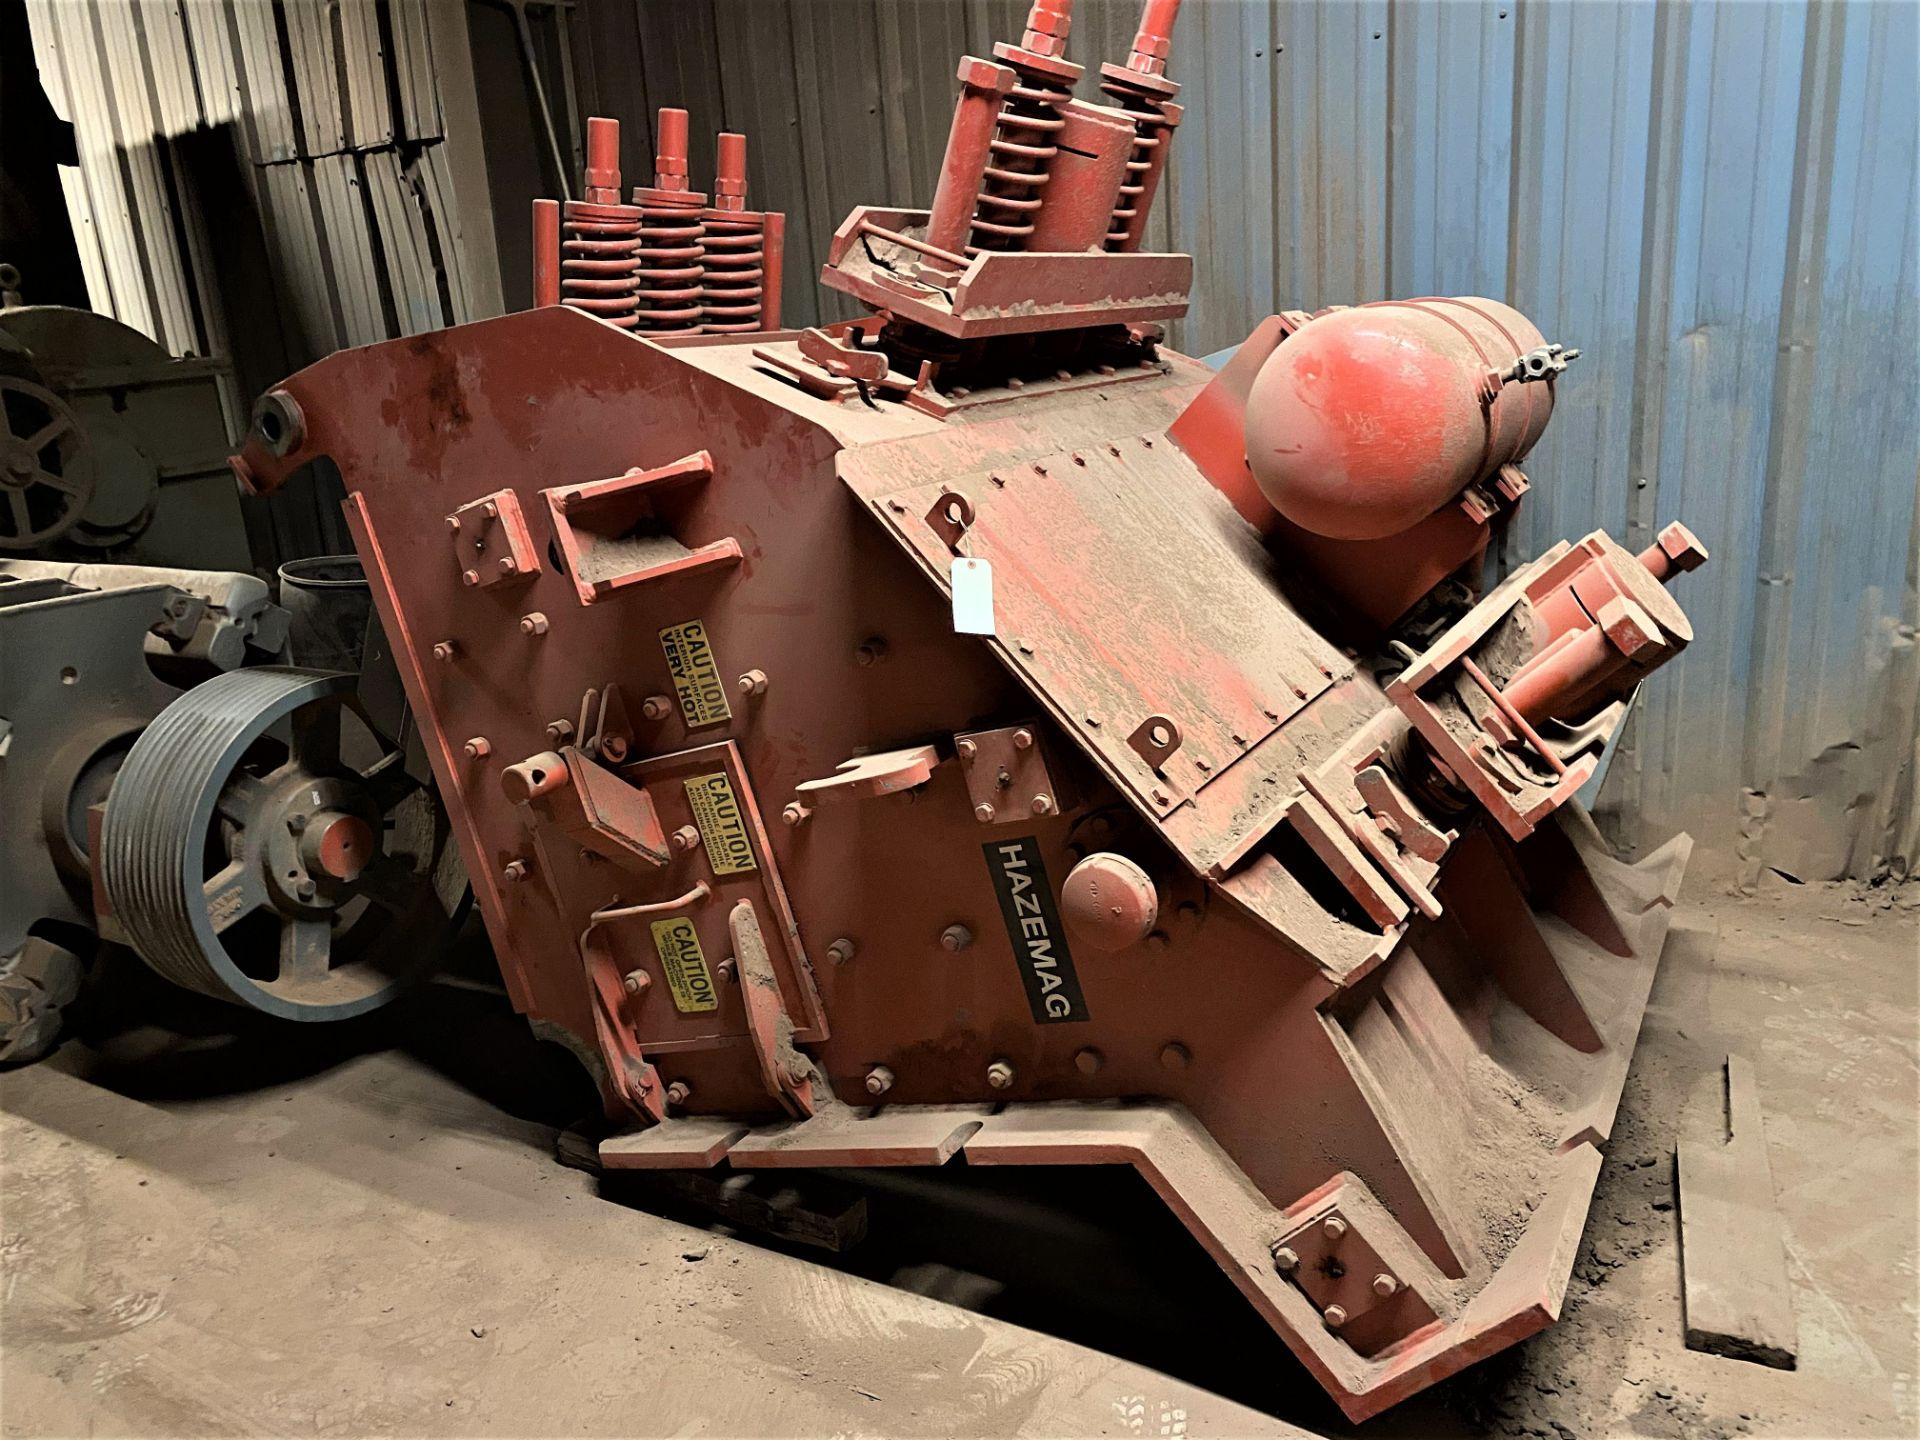 HAZEMAG IMPACT CRUSHER, MODEL 1315, 60'' DIAMETER ROTOR, 60'' WIDE, 575V, 450 HP - Image 5 of 25